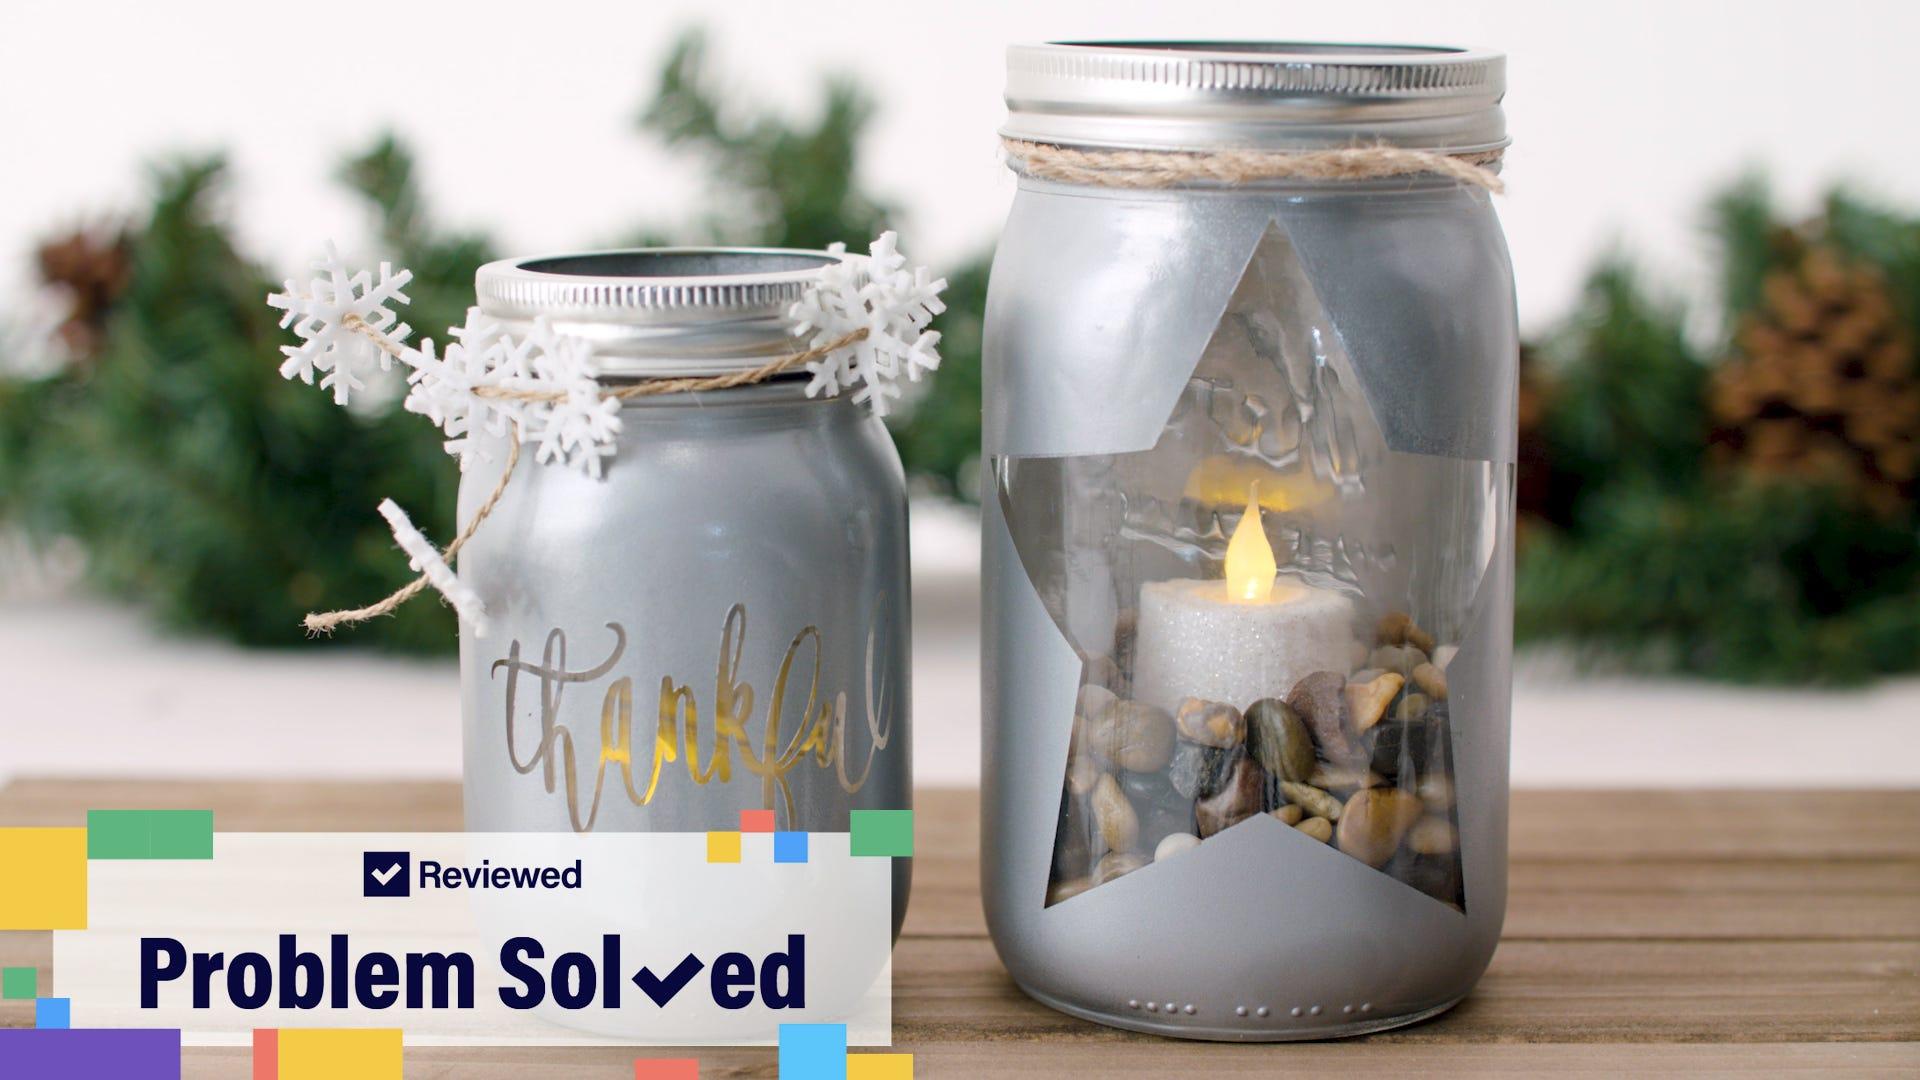 Make Mason jar lights as a holiday craft